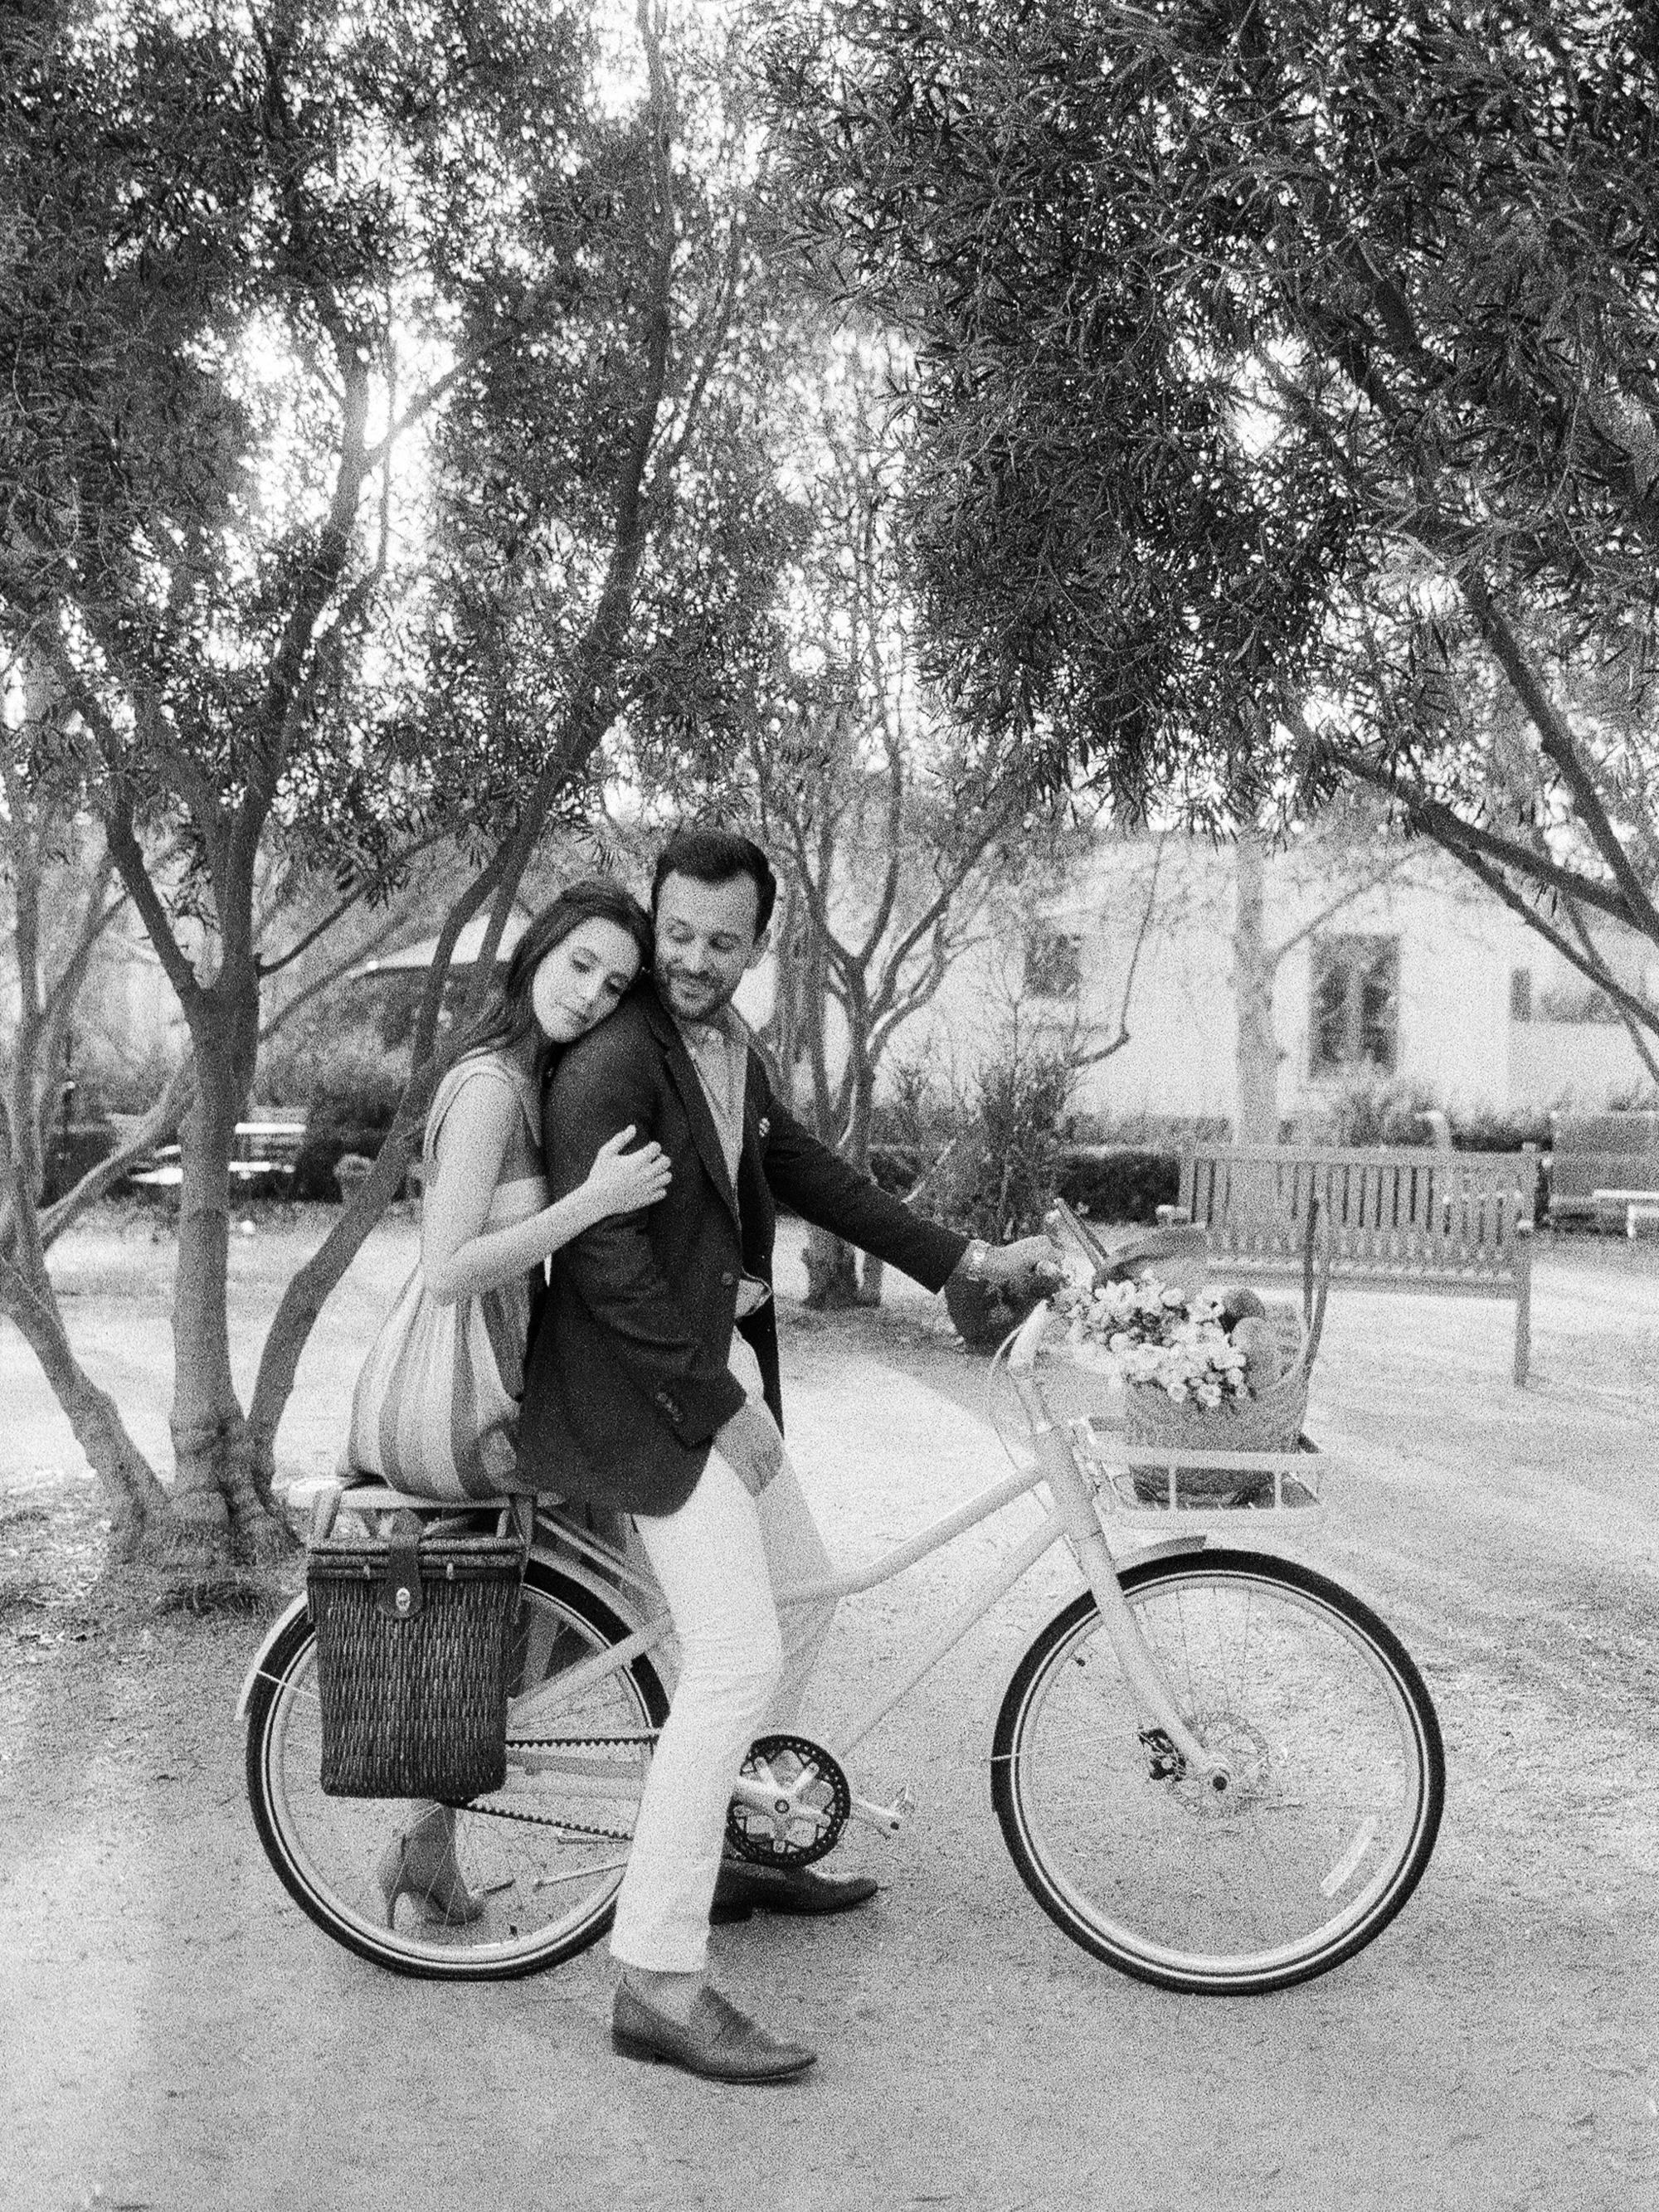 Bicycle_Engagement_Pasadena-110-Jen_Huang-000007180009.jpg